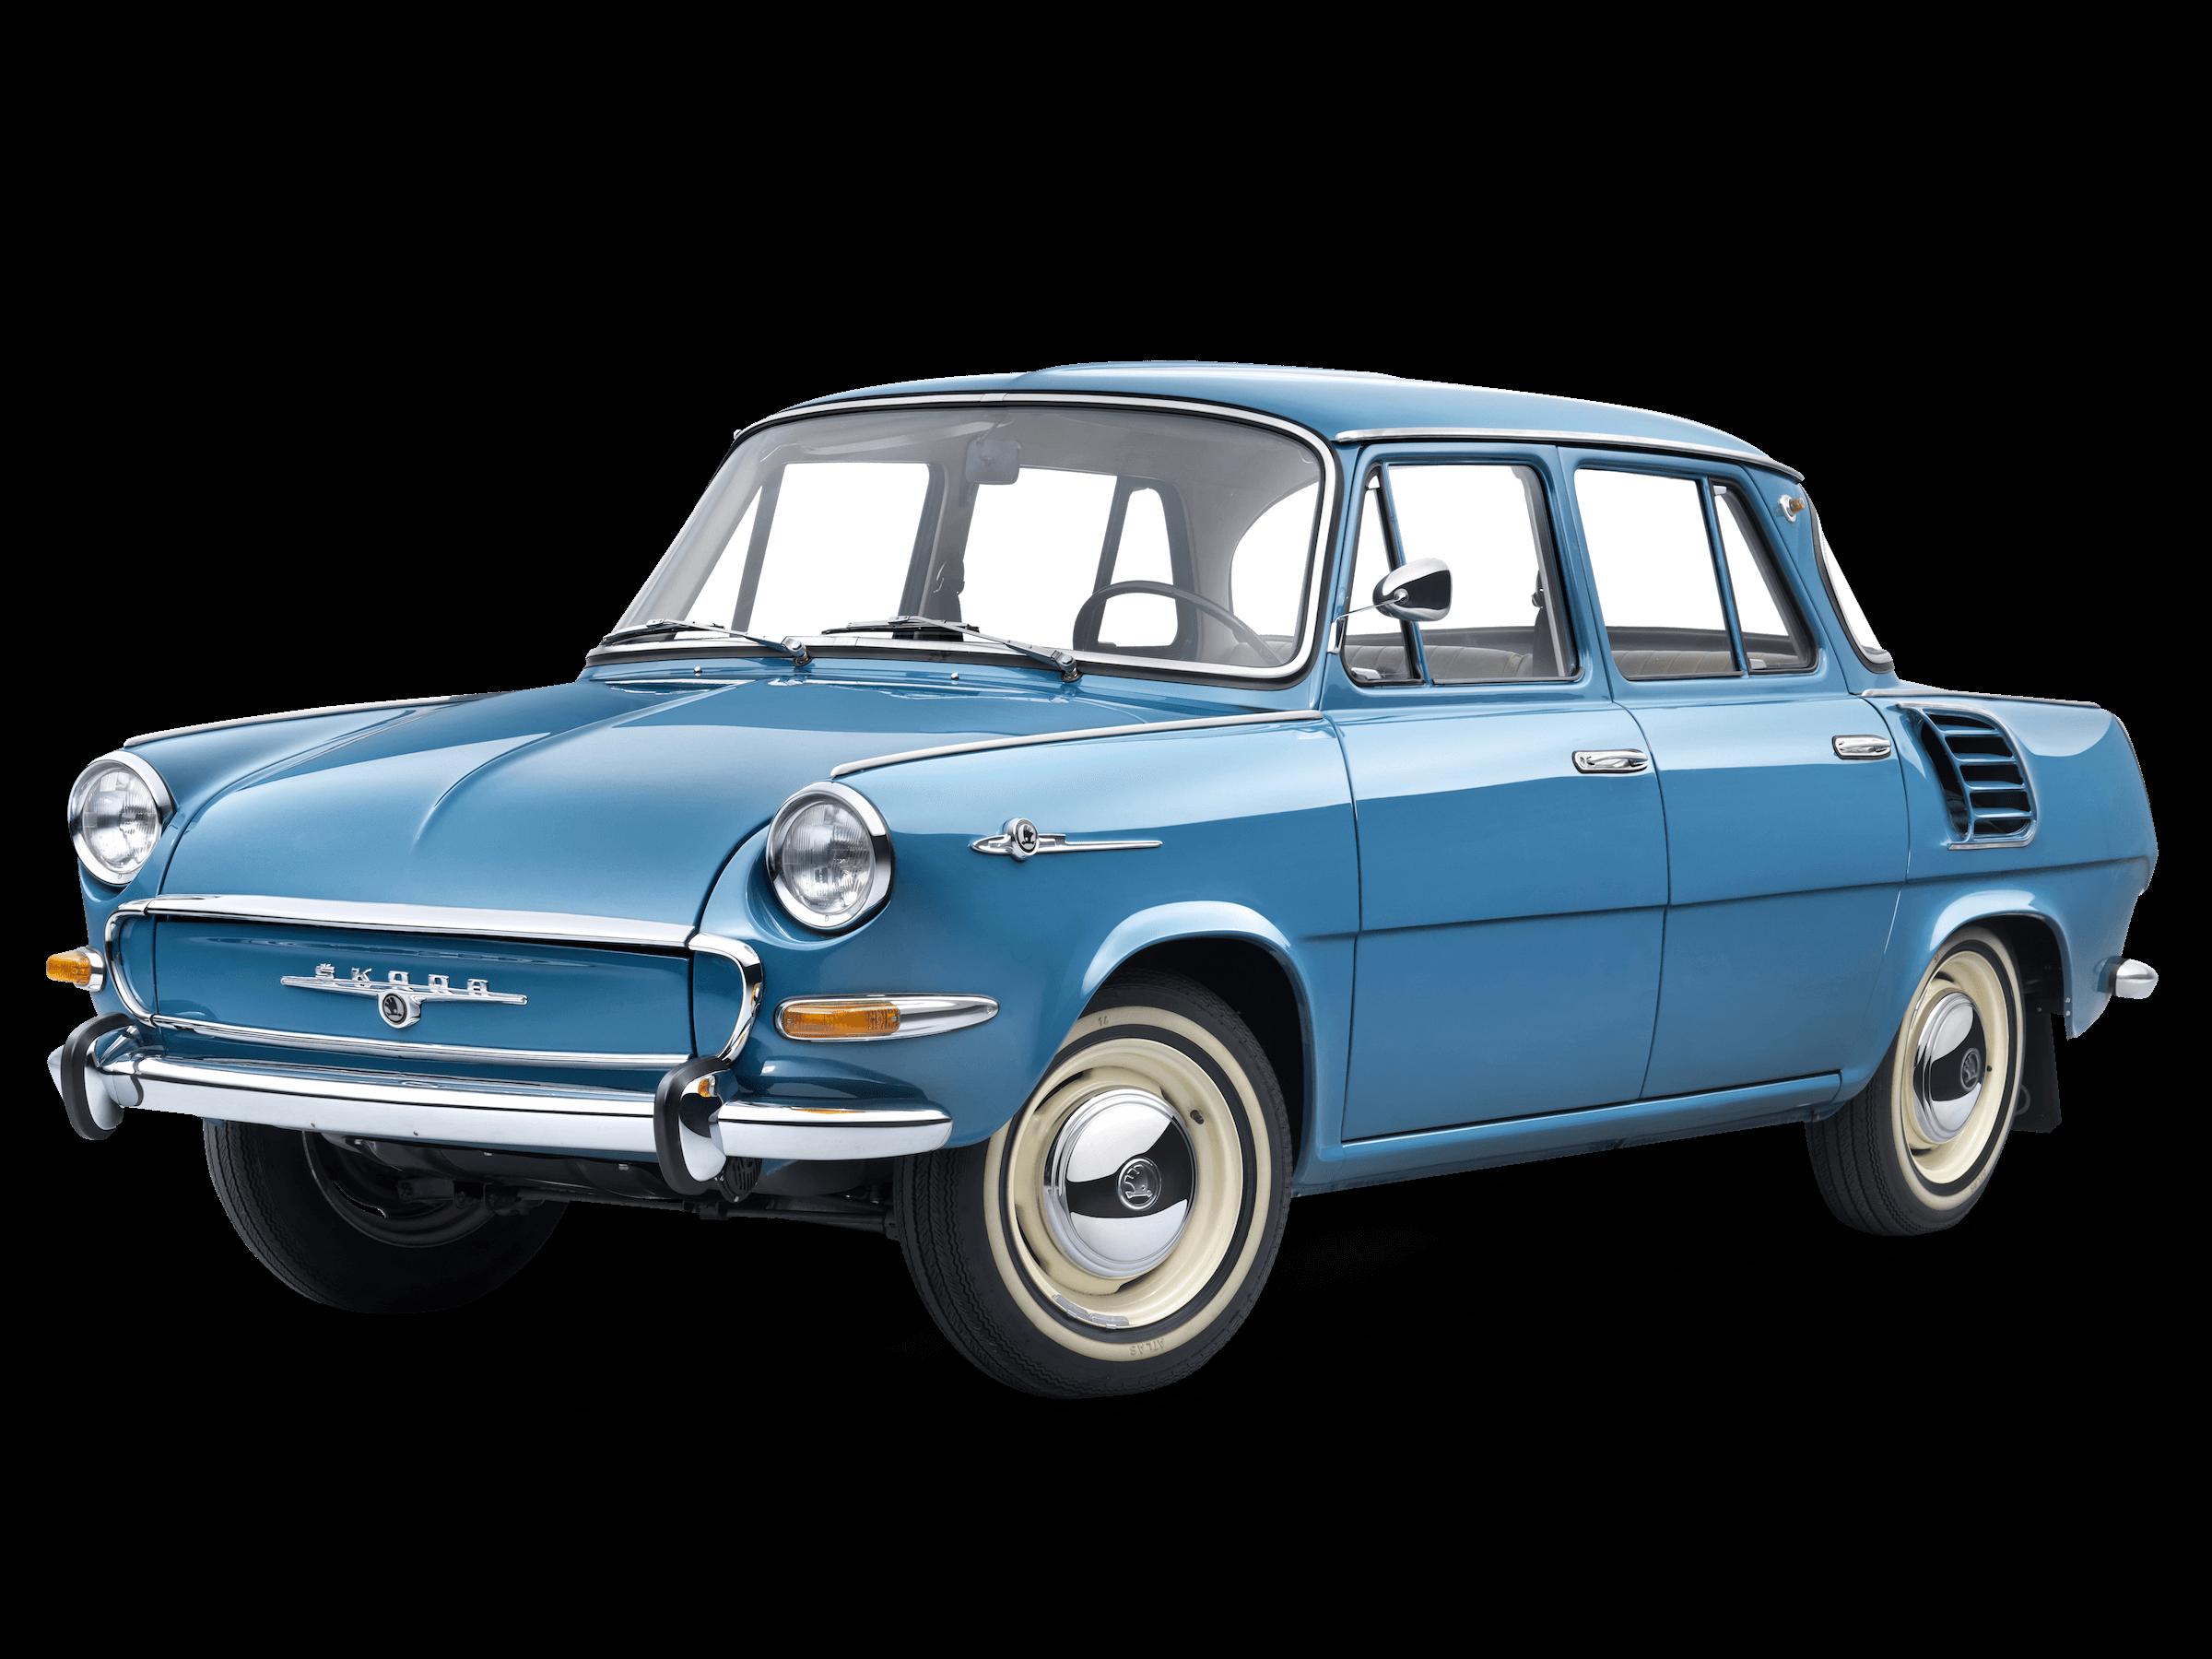 Skoda 100 Series I 1969 - 1984 Coupe #3